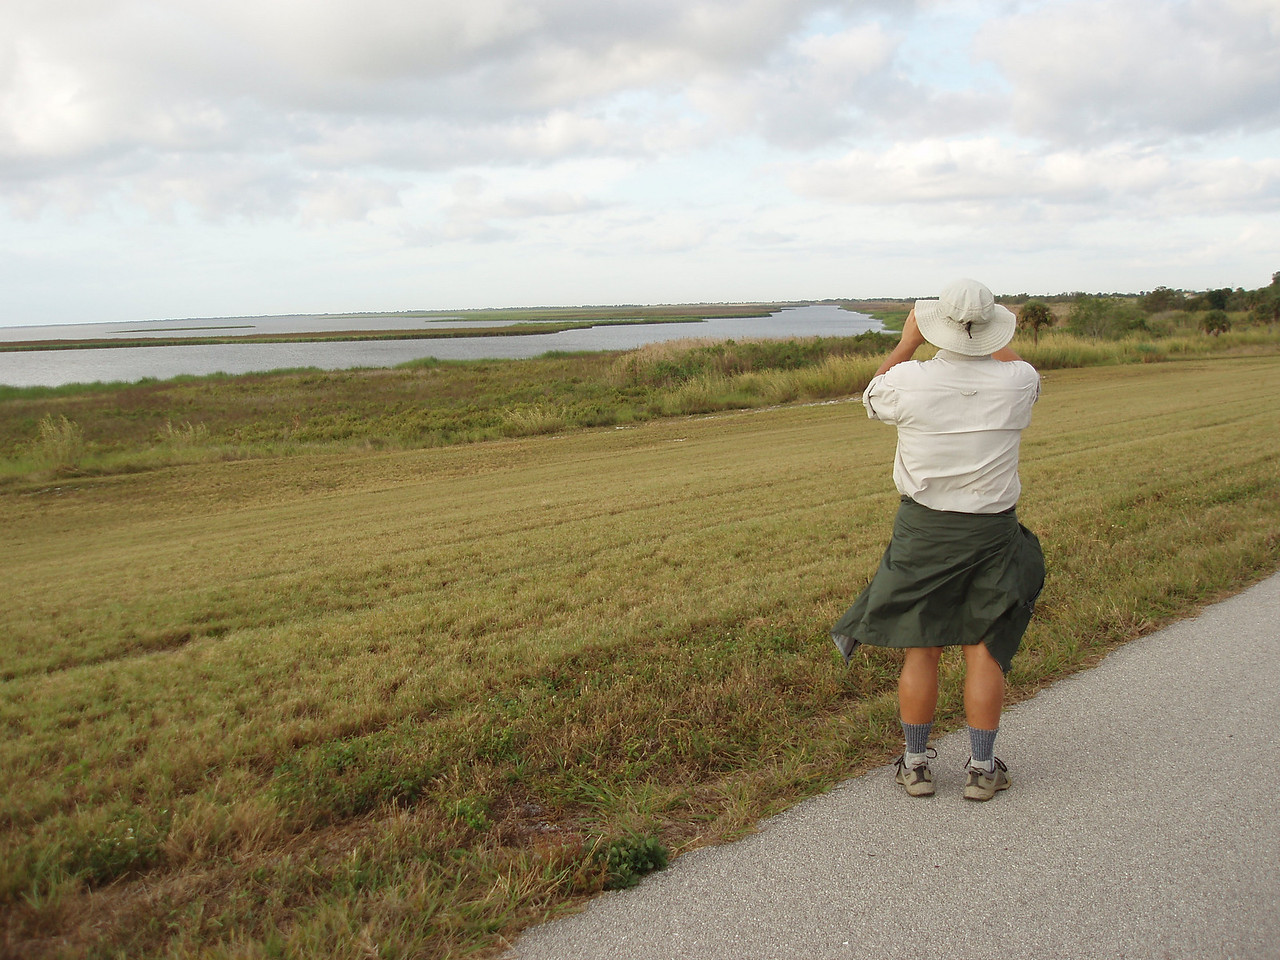 Birdwatching at Chauncey Bay<br /> PHOTO CREDIT: Robert Coveney / Florida Trail Association